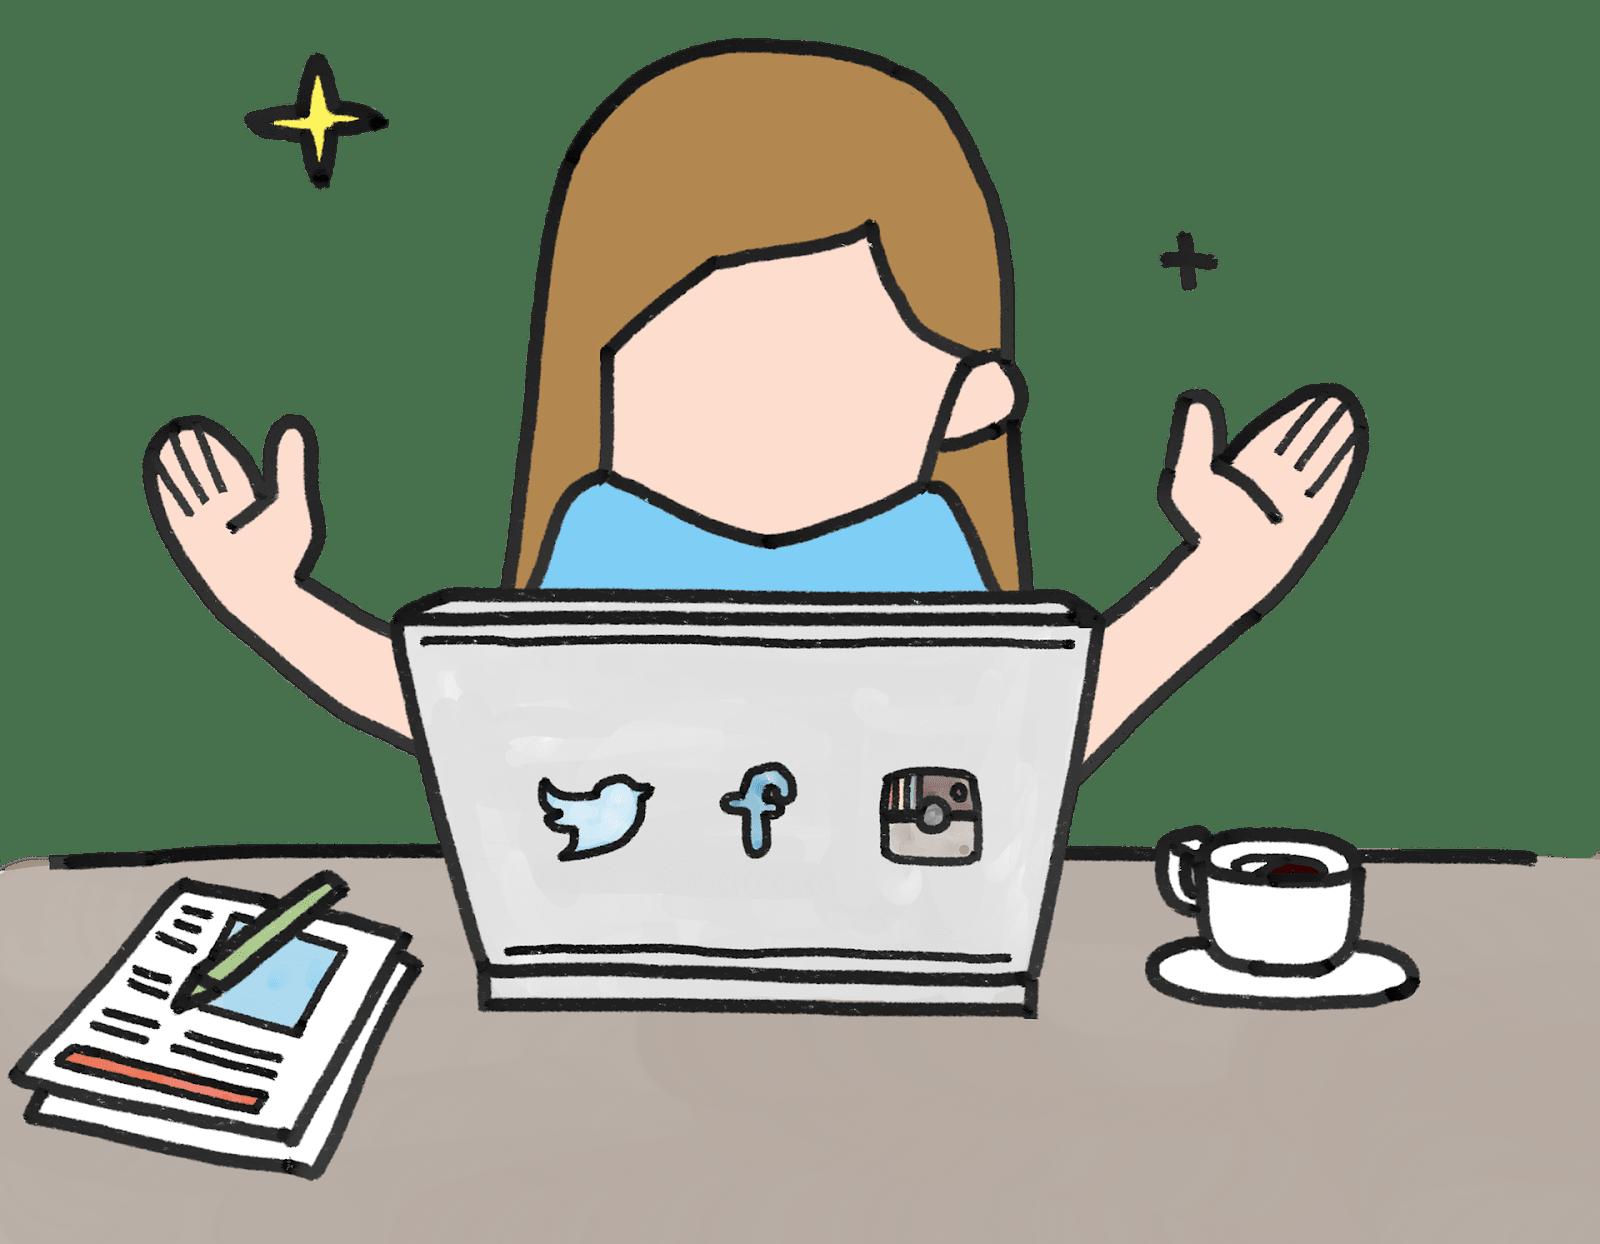 cartoon woman in front of laptop on Instagram